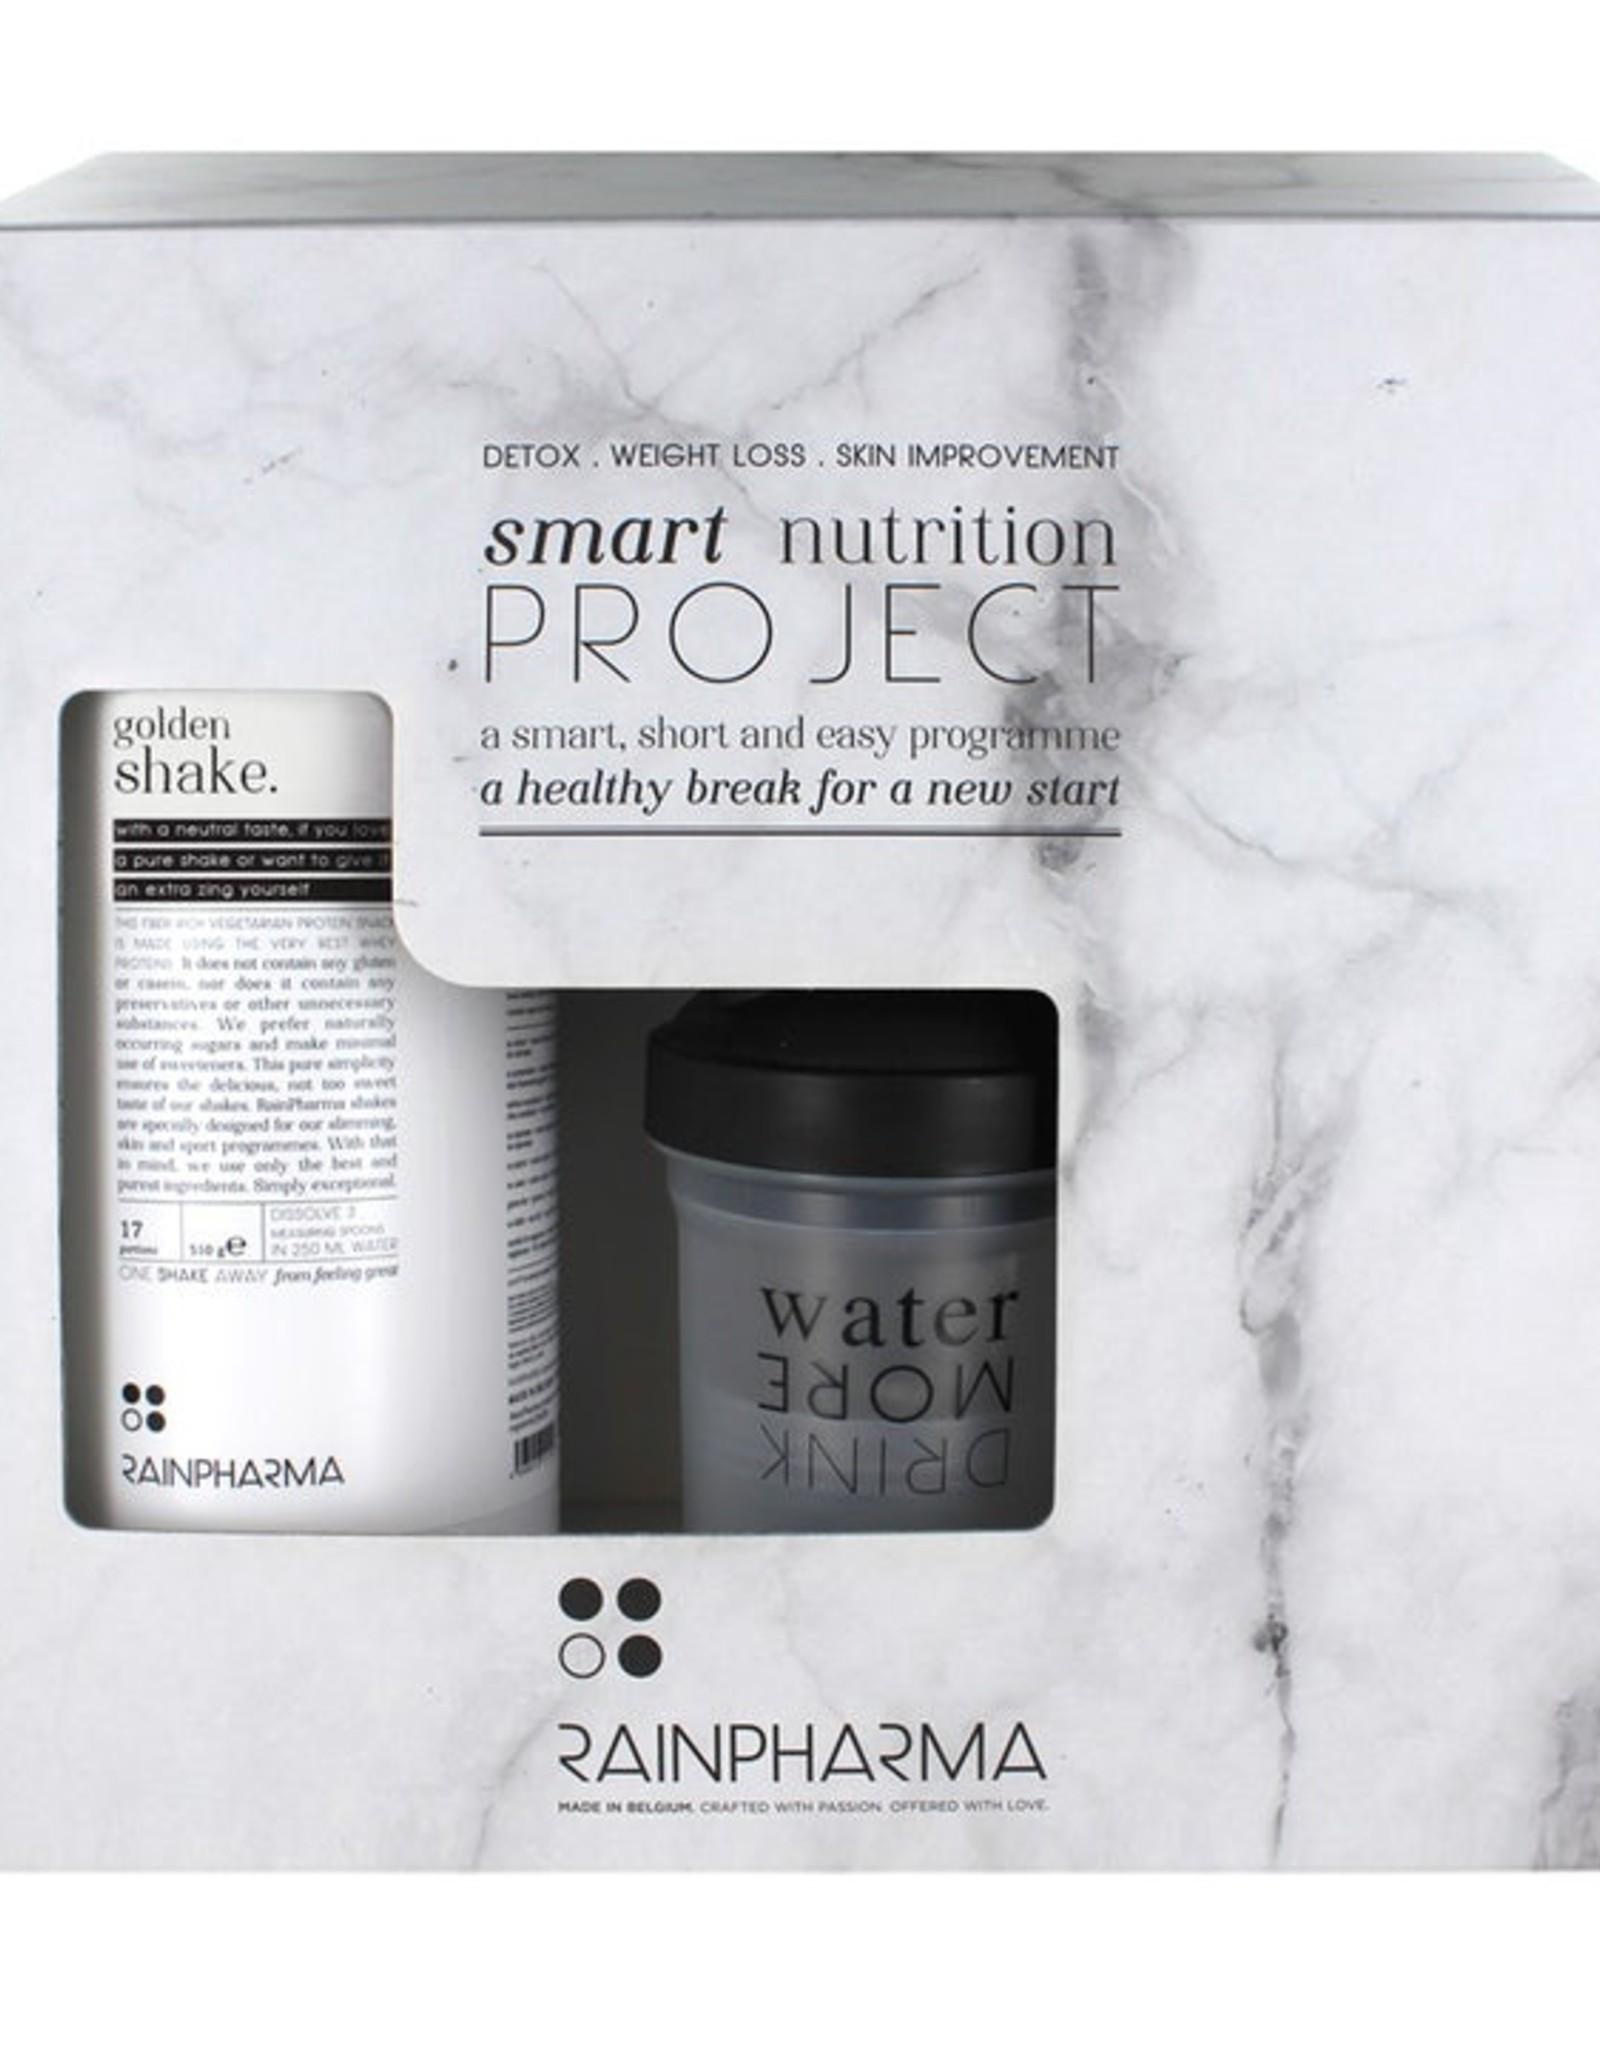 RainPharma Rainpharma - SNP BOX Golden Shake